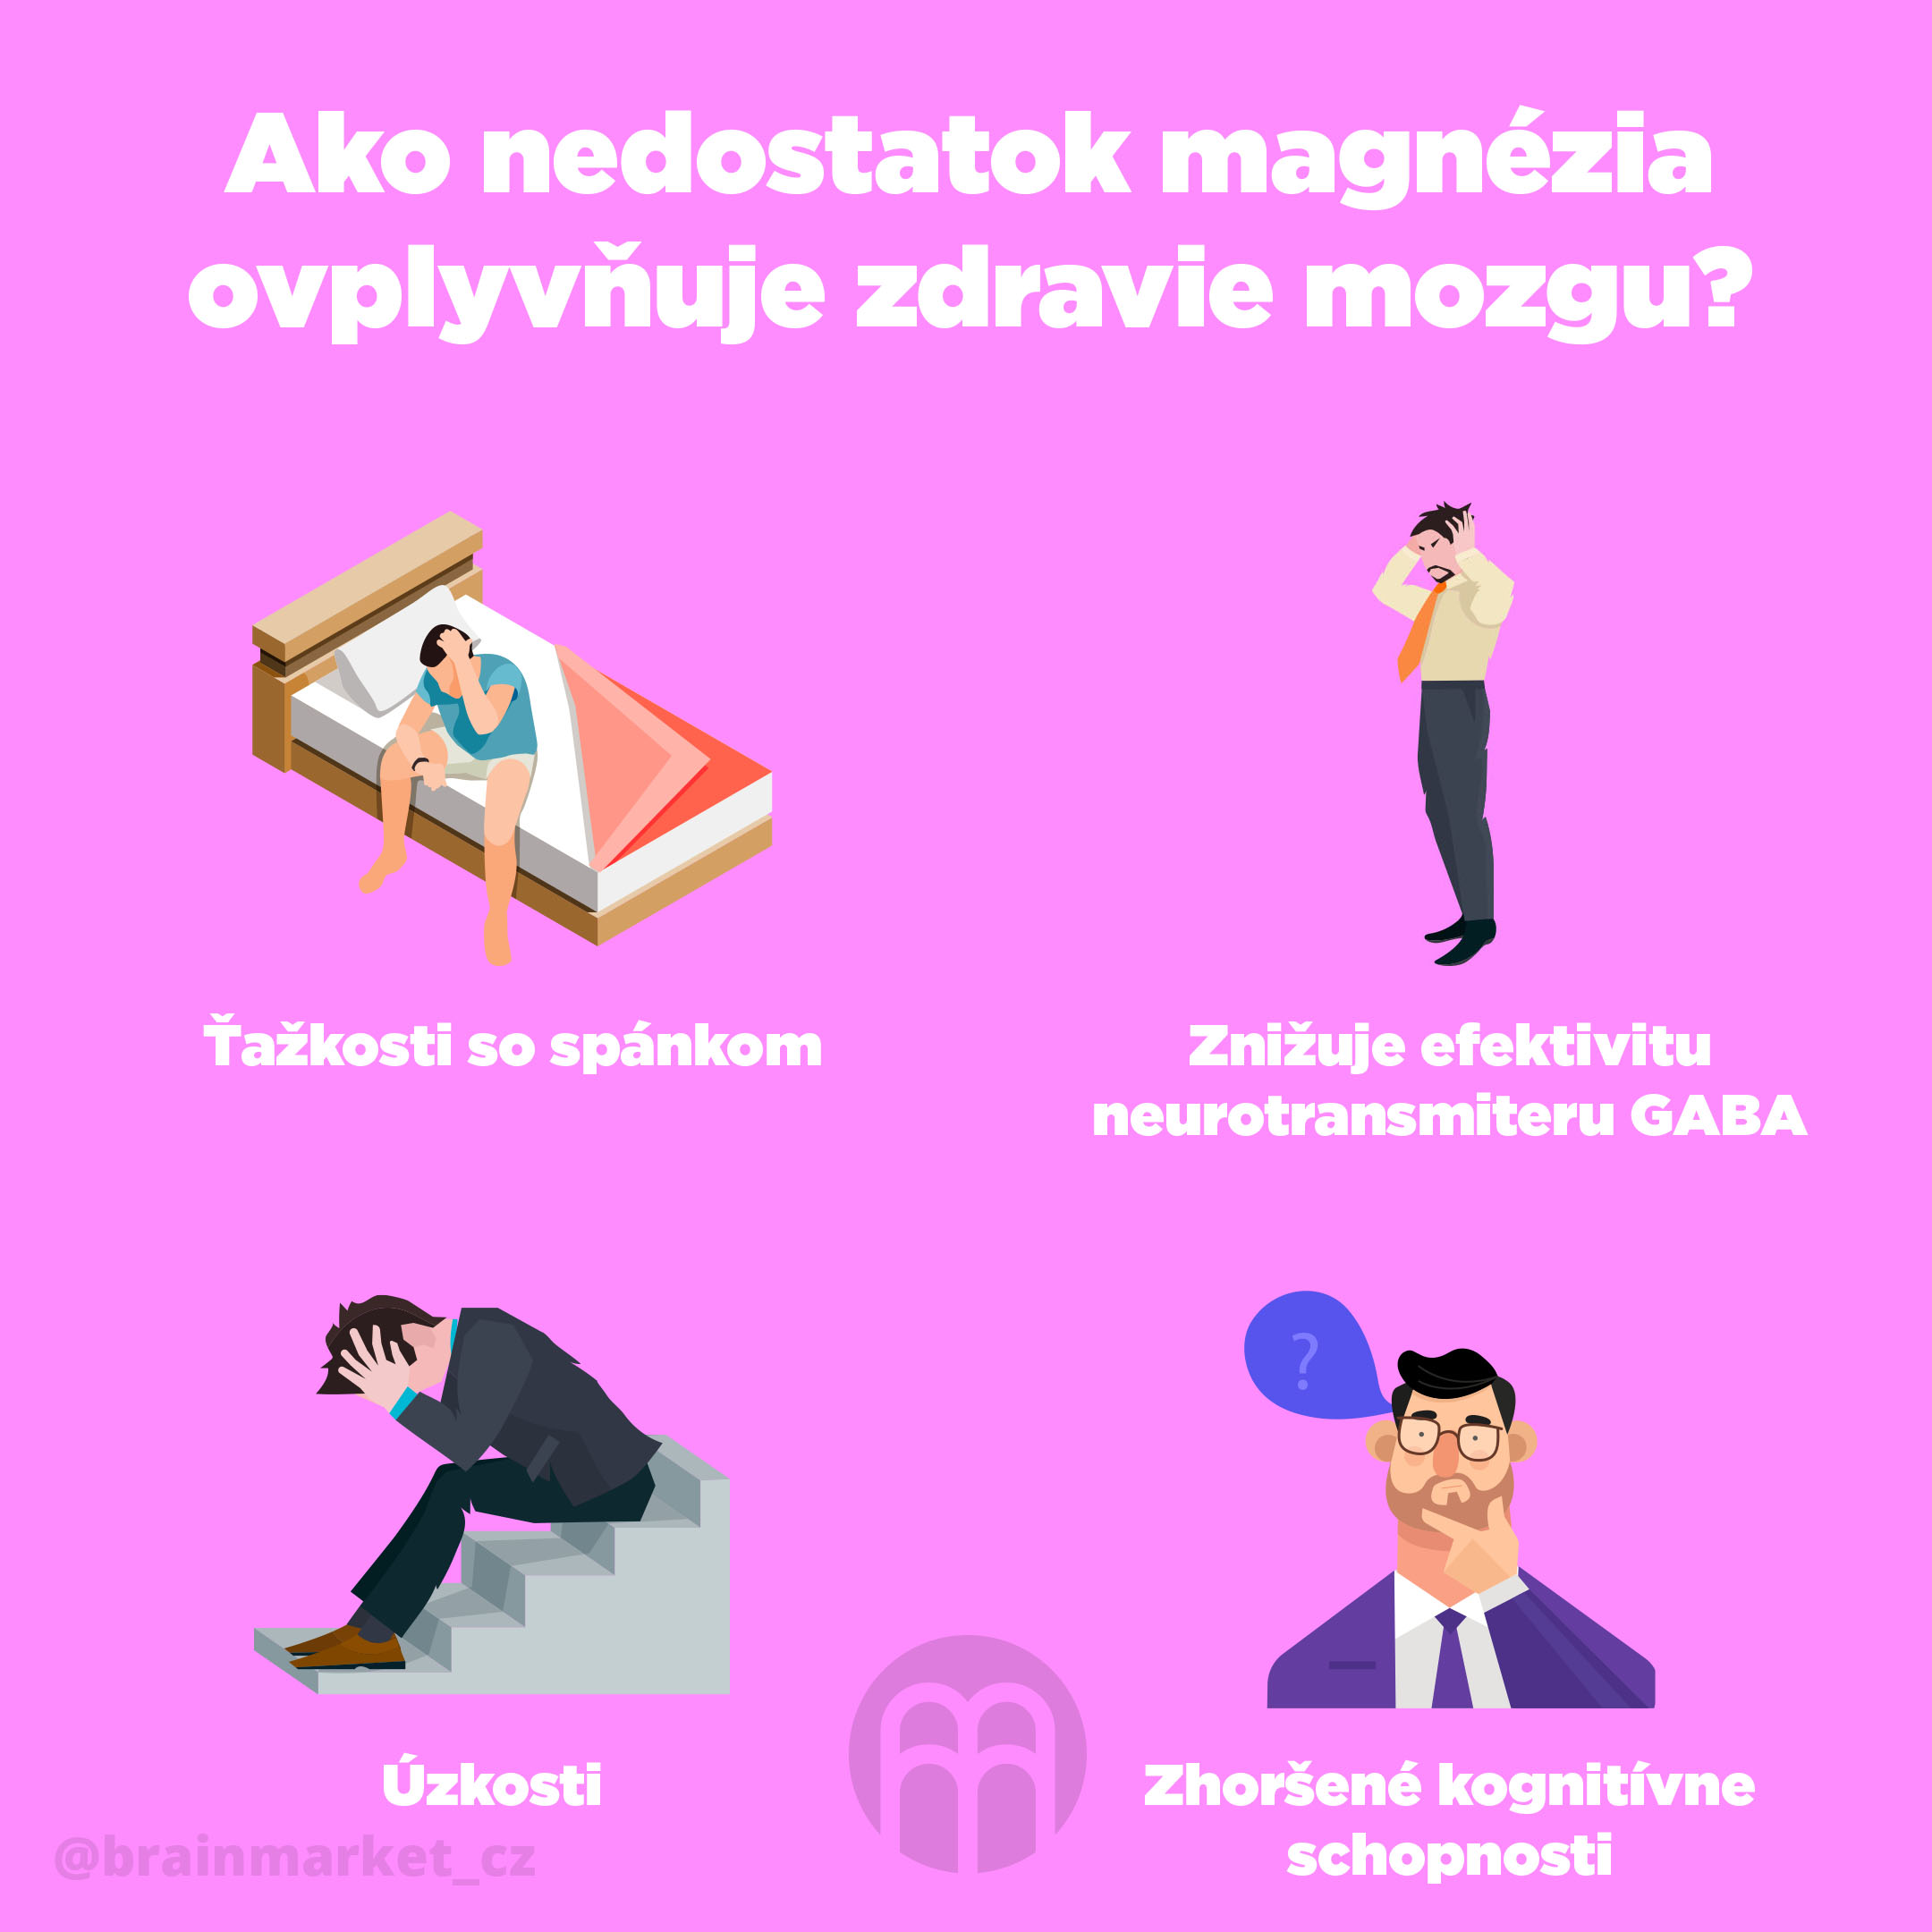 ako_nedostatek_magnezia_ovplyvnuje_zdravie_mozgu